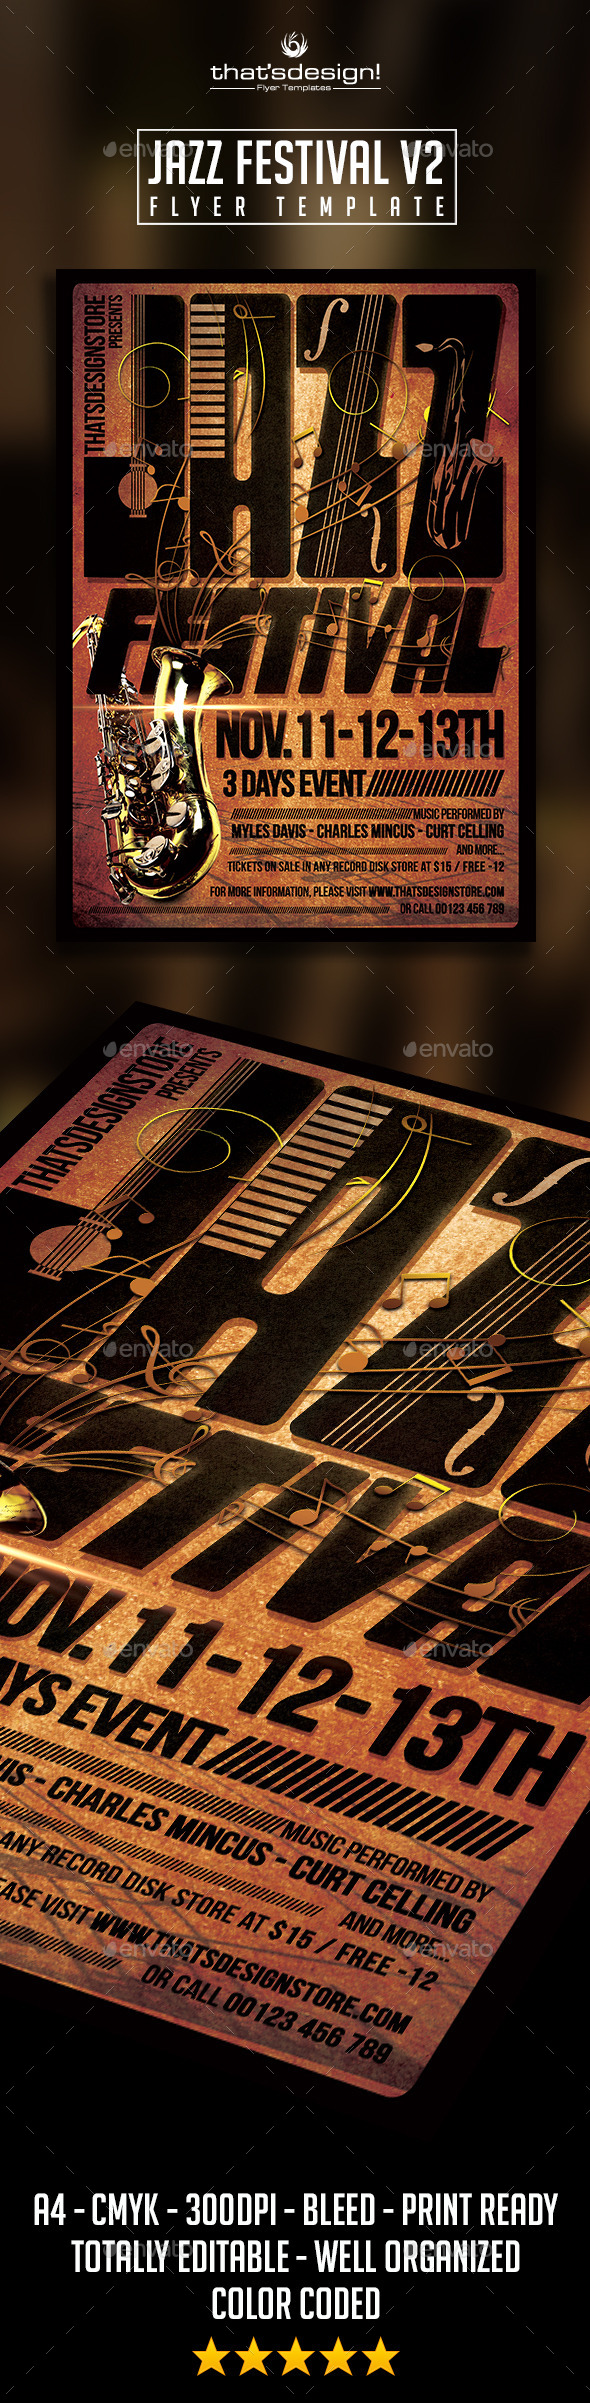 GraphicRiver Jazz Festival Flyer Template V2 10187470